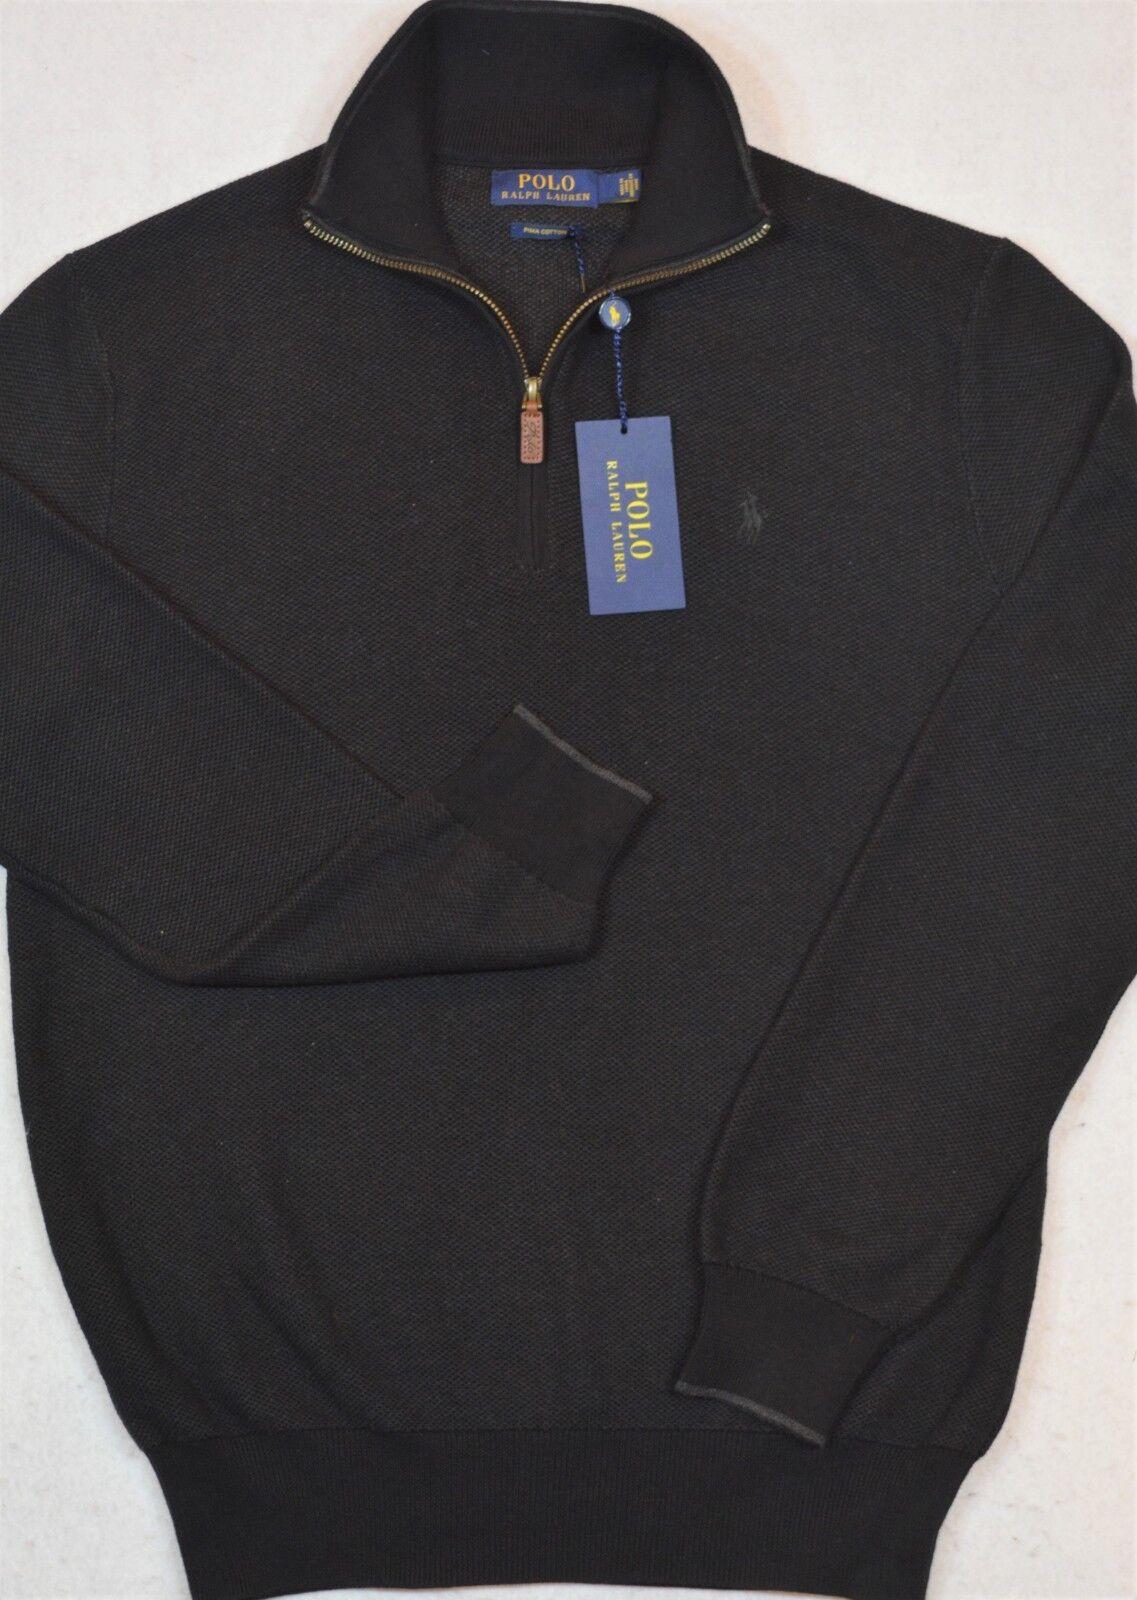 Polo Ralph Lauren Sweater Pima Cotton Half-Zip Charcoal M NWT 99